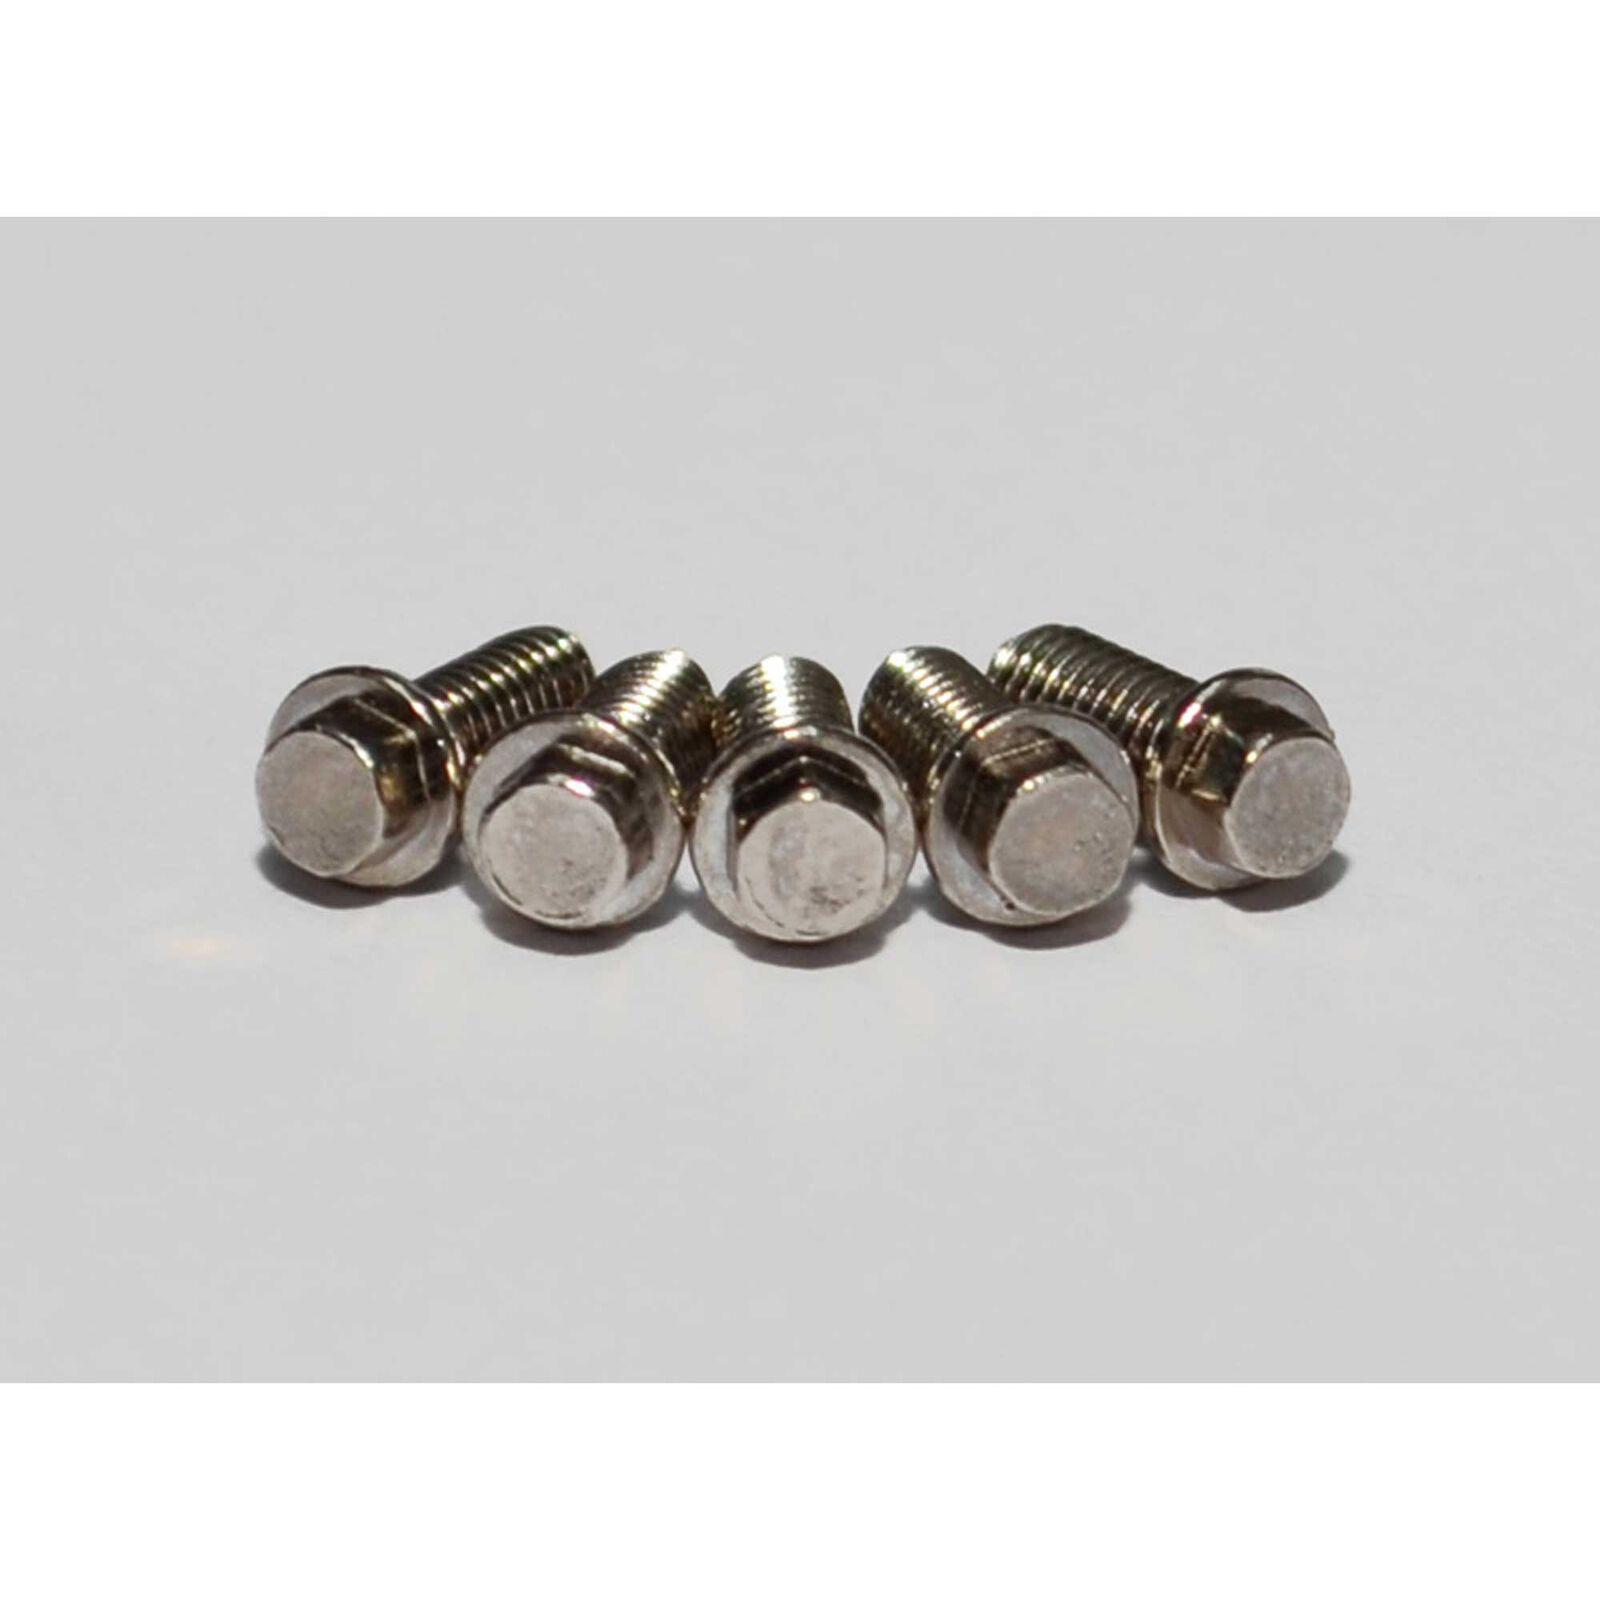 Miniature Scale Hex Bolts, M2.5 x 6mm, Silver (20)